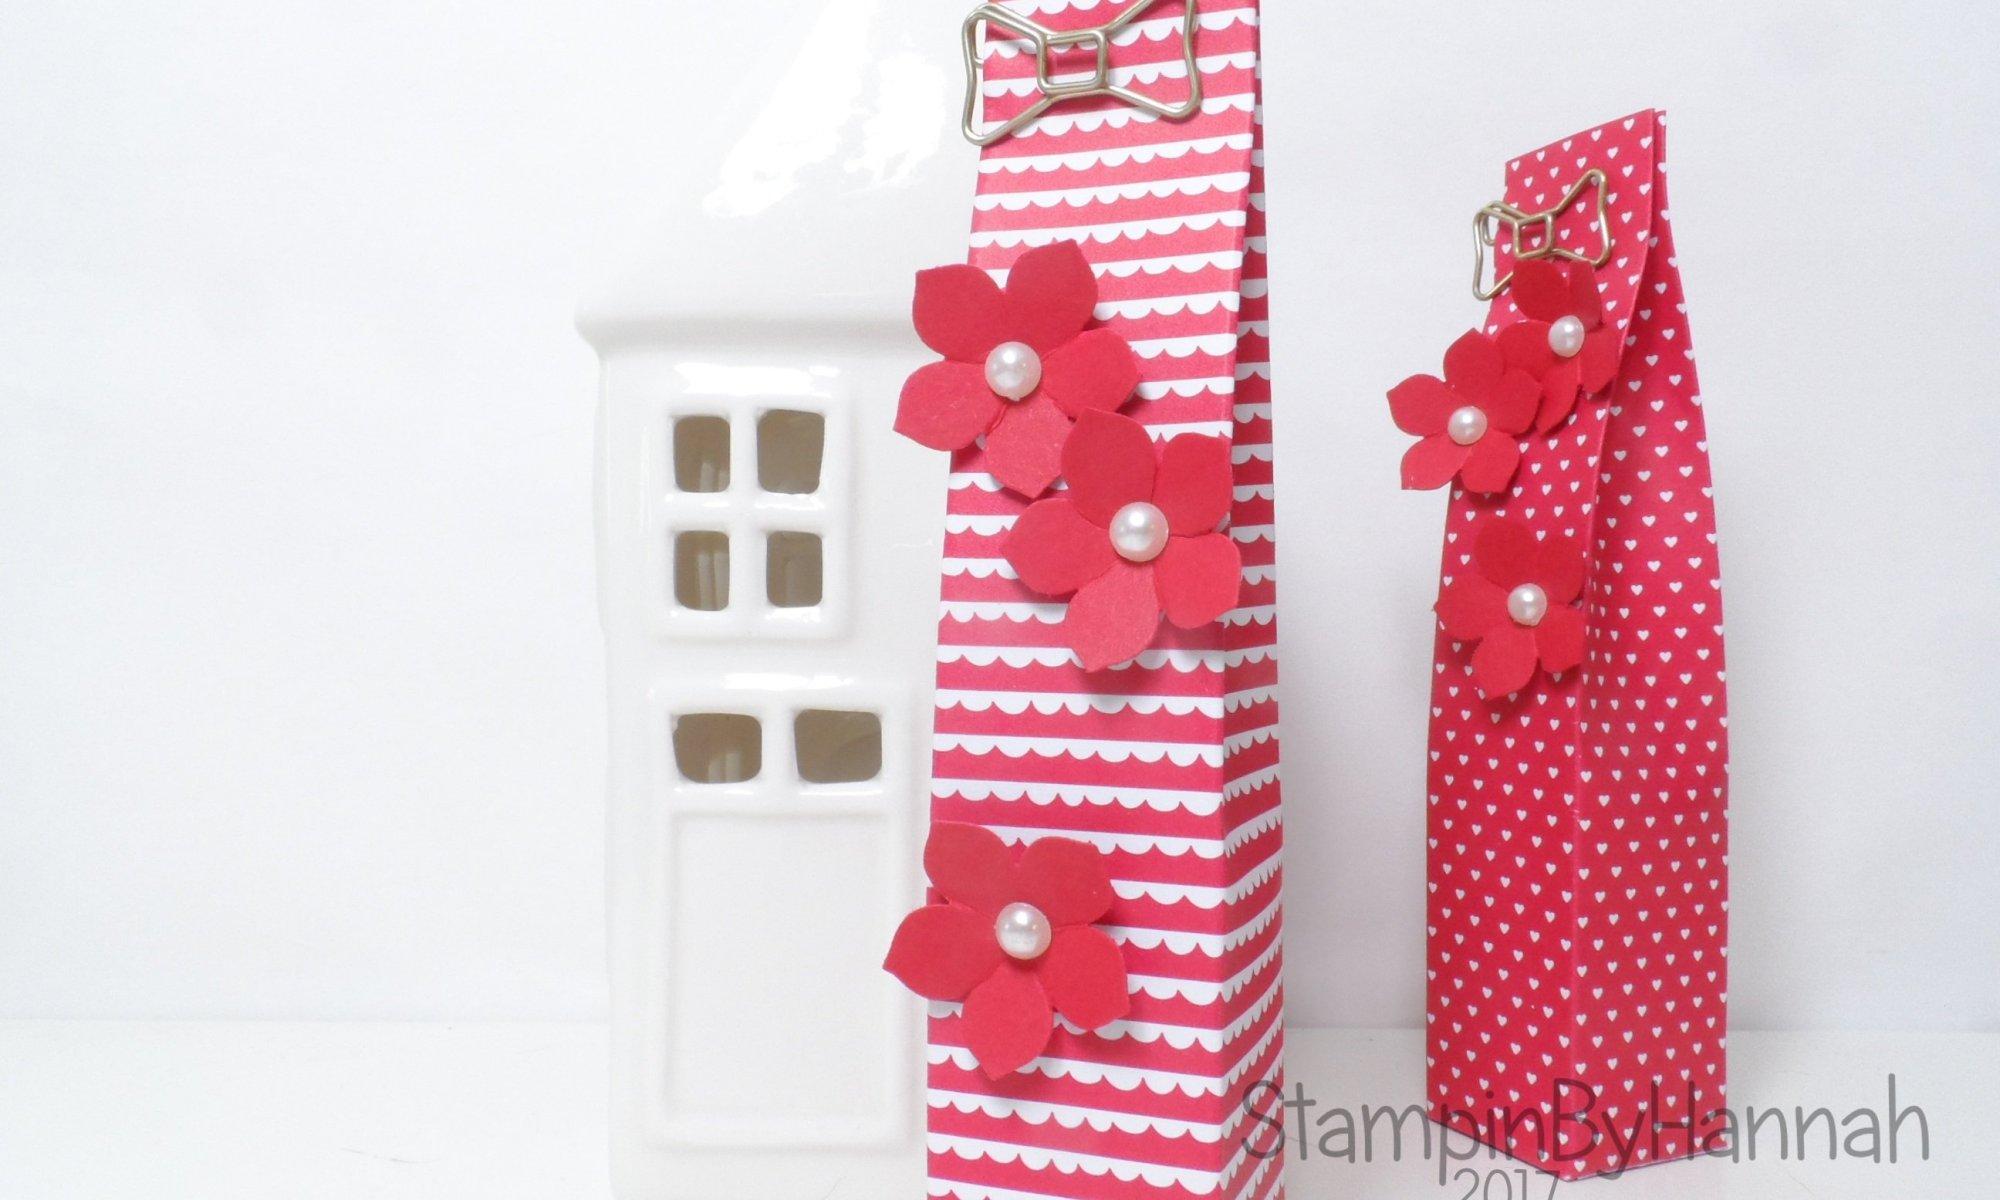 Love hearts week tall skinny gift bag using Sending Love Designer Series Paper from Stampin' Up! UK